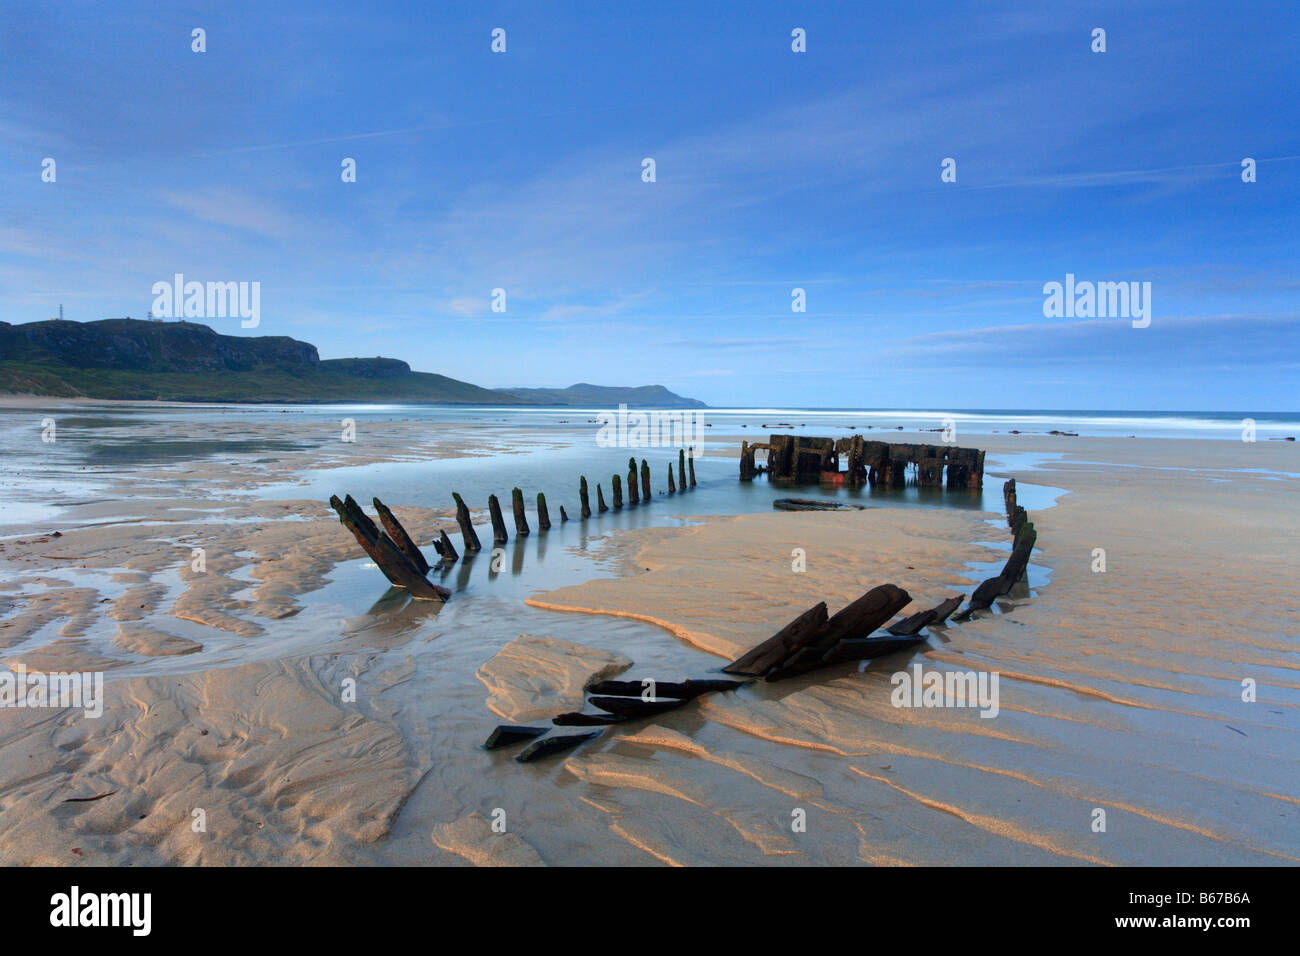 'Machir bay' beach shipwreck at dawn 'Islay' island Scottish Inner Hebrides, Scotland, UK - Stock Image